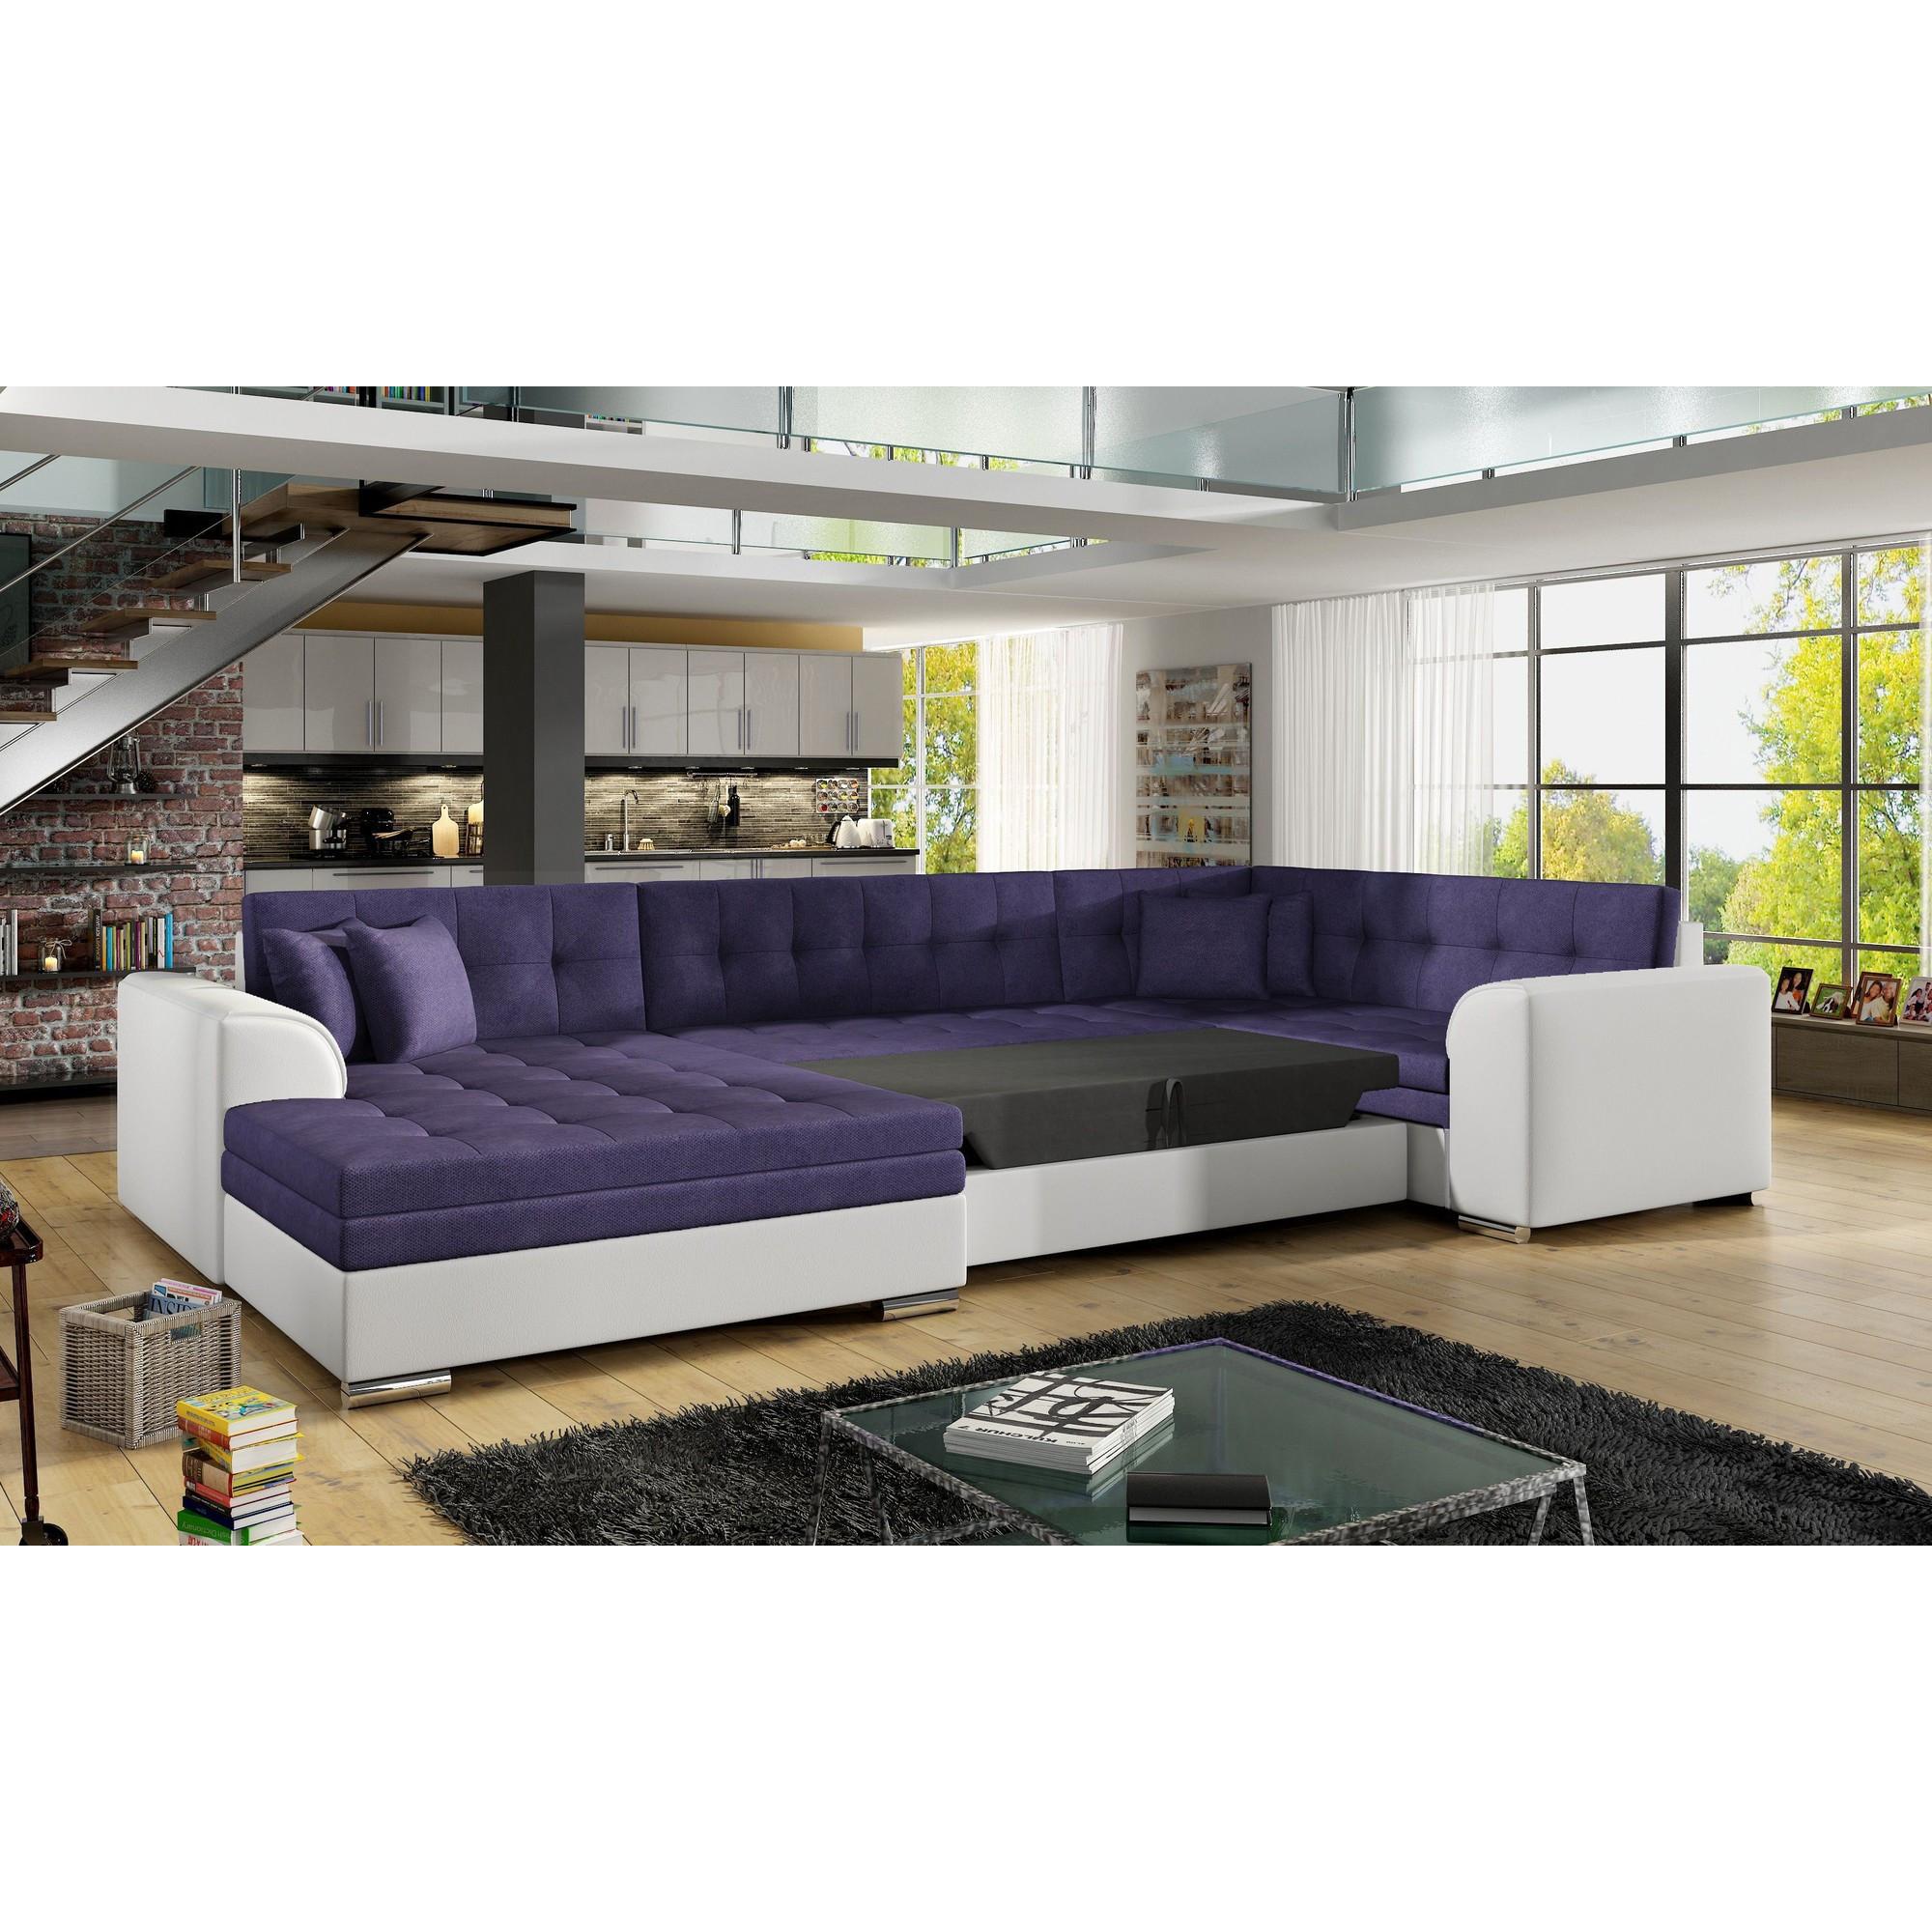 Canapé d angle convertible 6 places en tissu cappuccino et